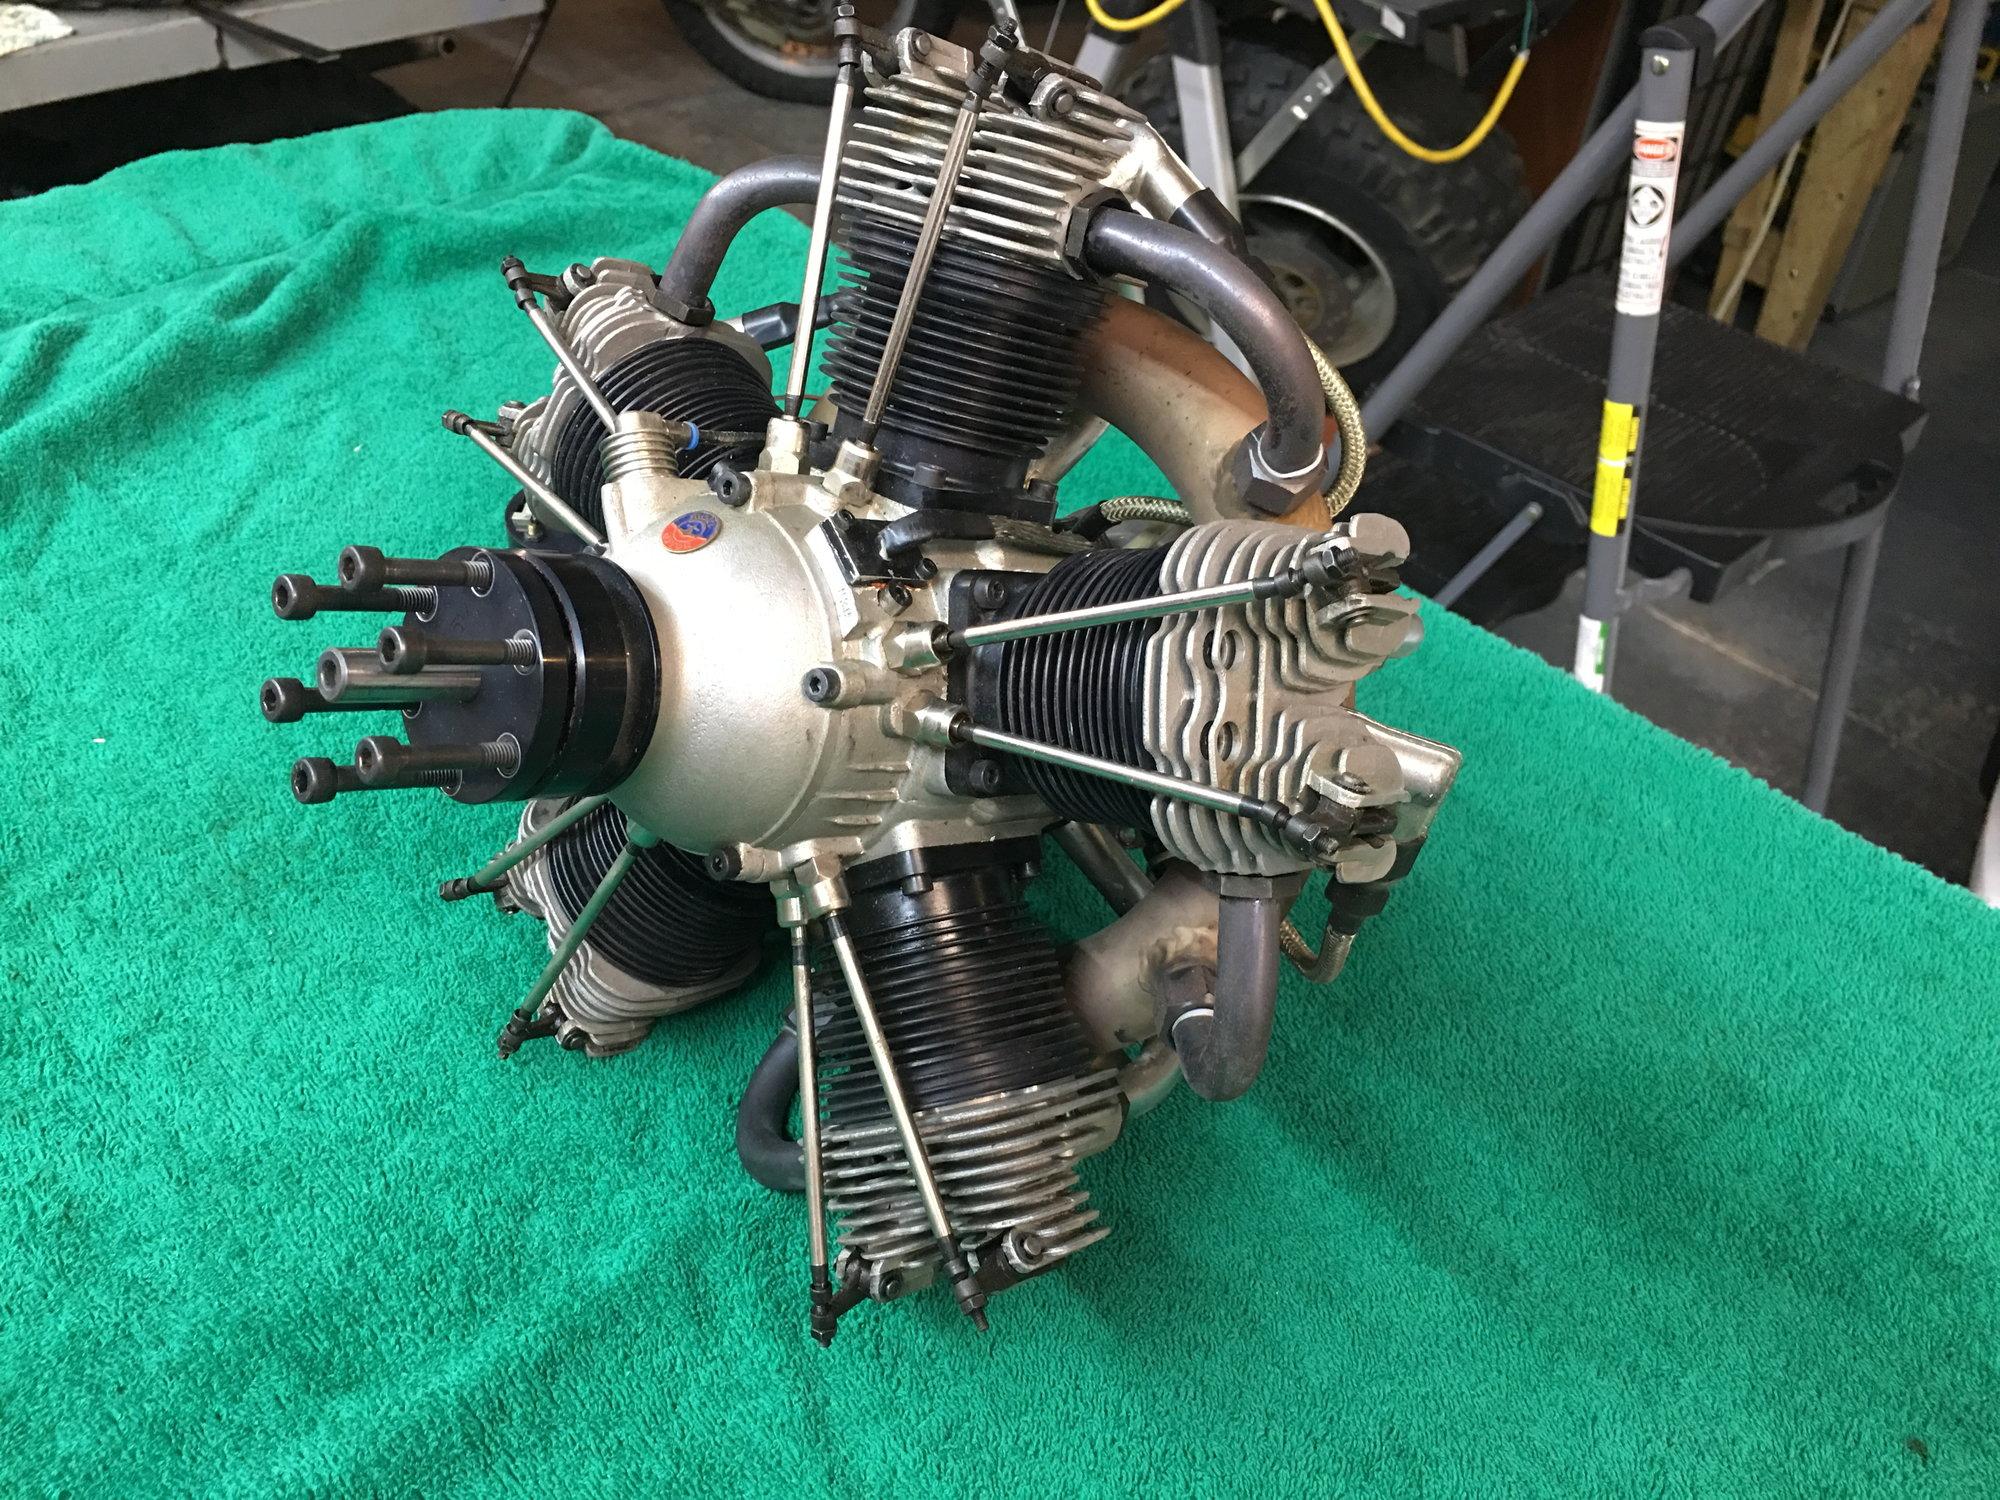 Moki 215 5 cylinder radial - RCU Forums